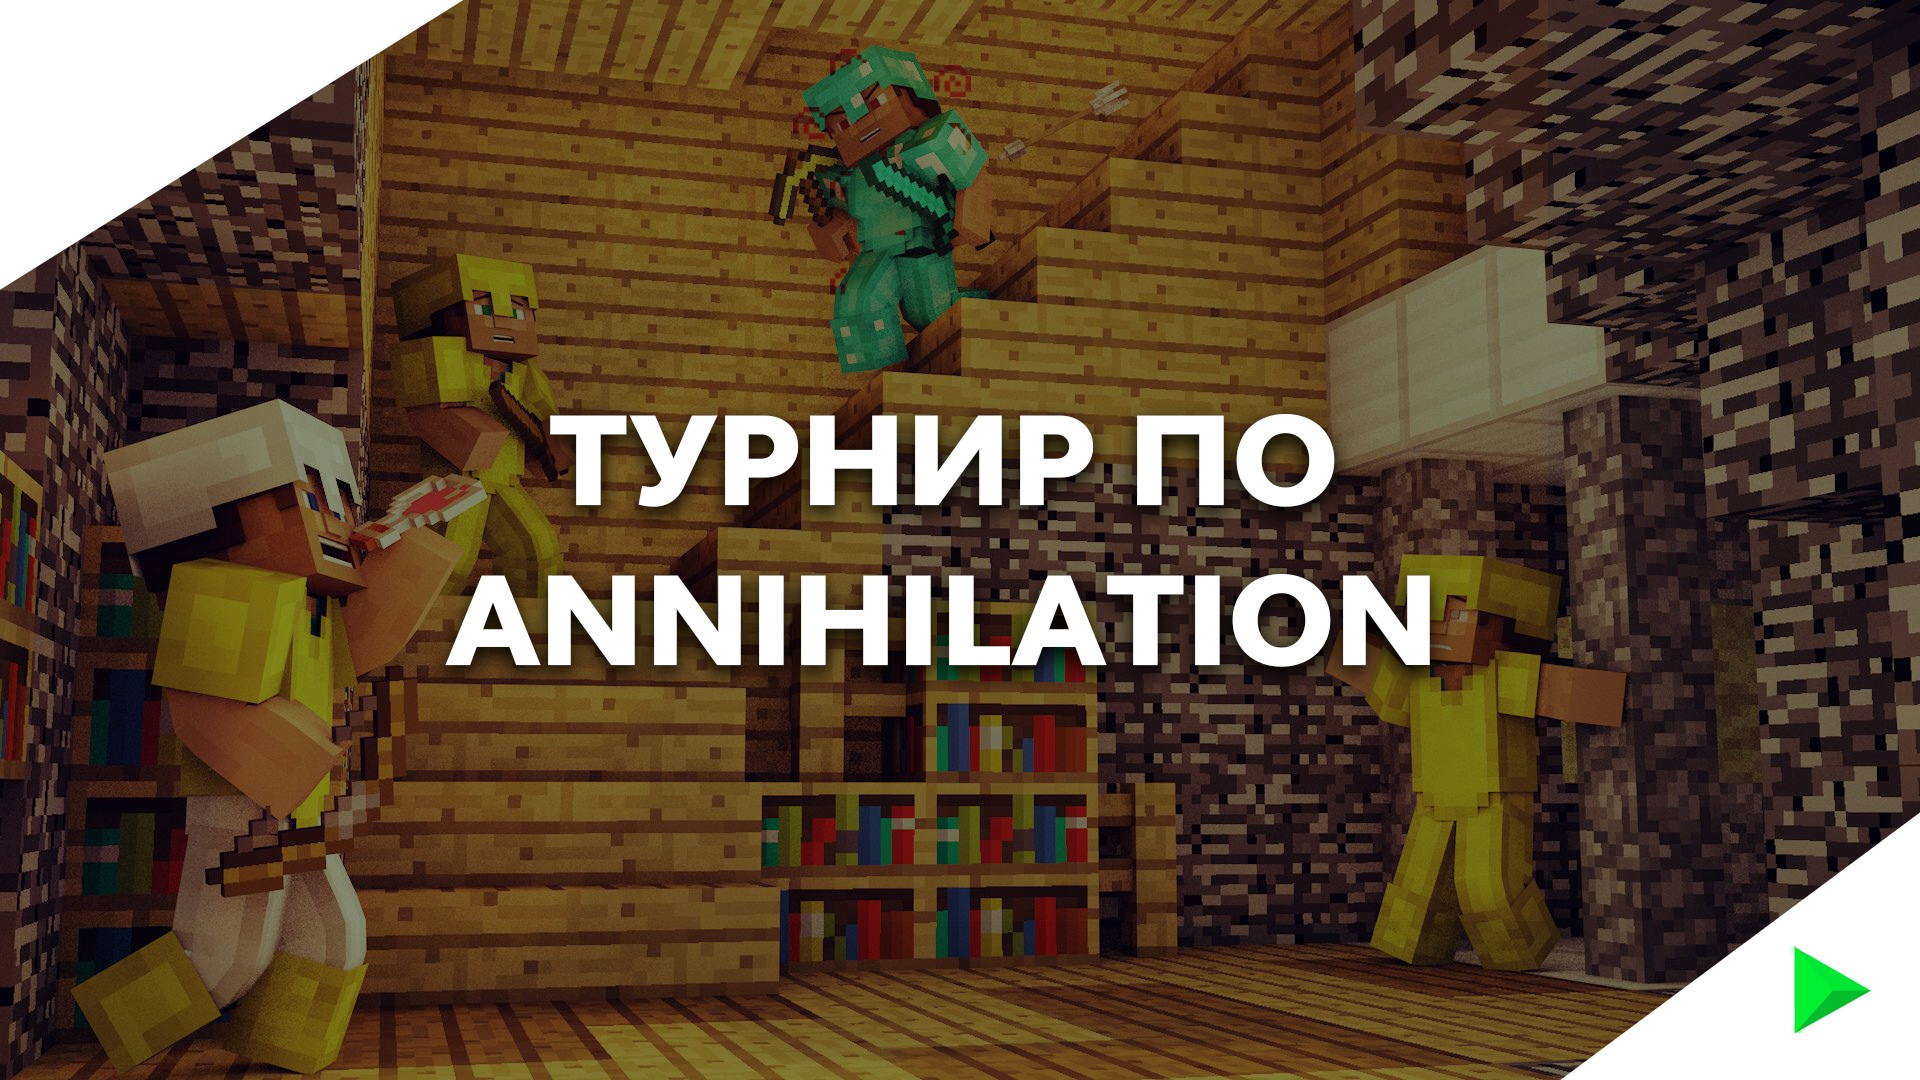 Турнир по Annihilation: Этап 1